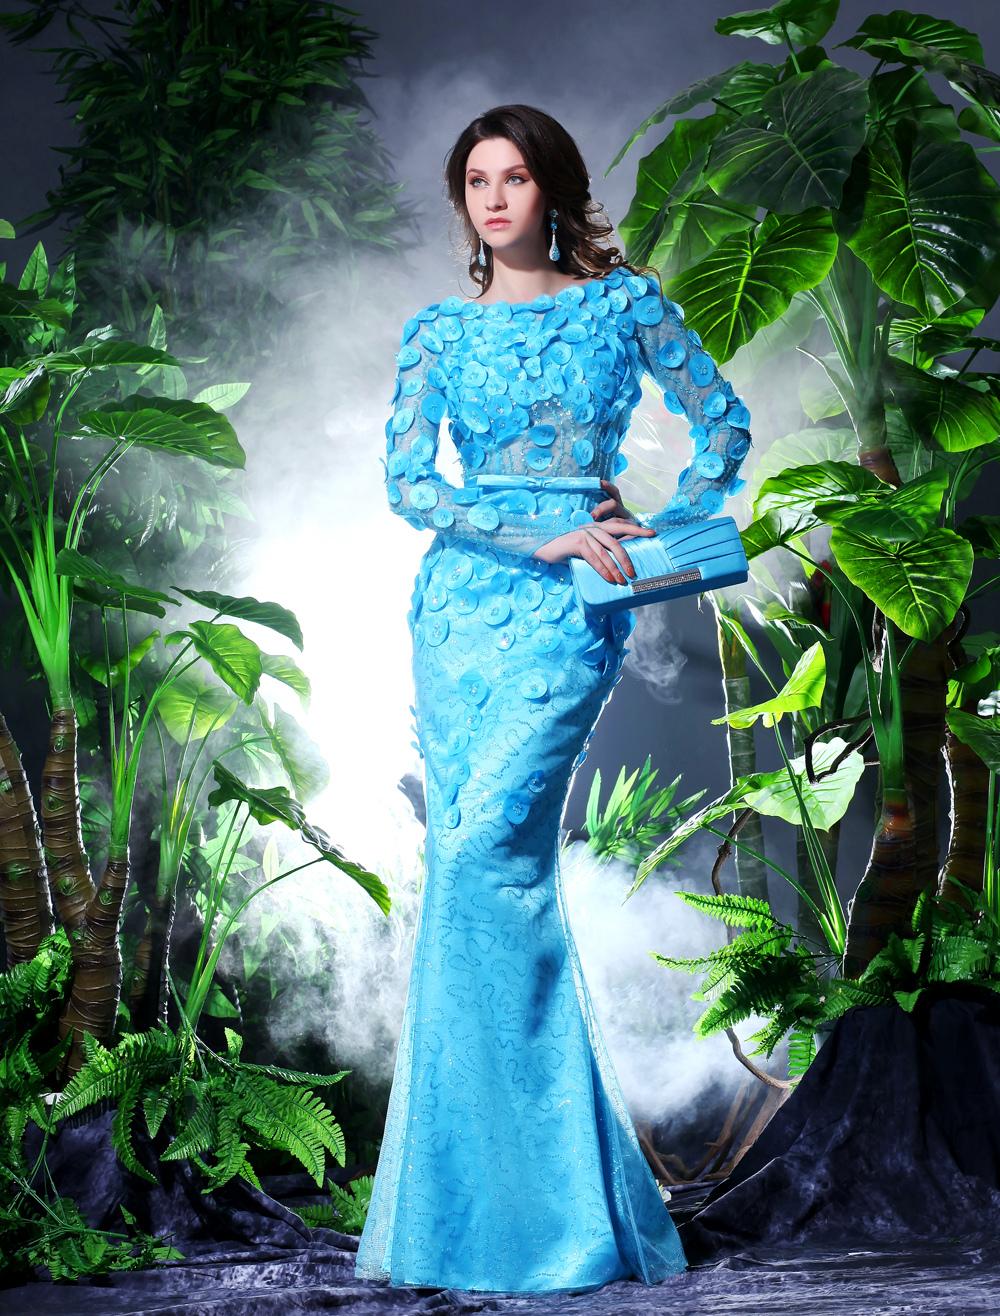 Elegant Mermaid Illusion Bodice Flower Evening Dress Milanoo